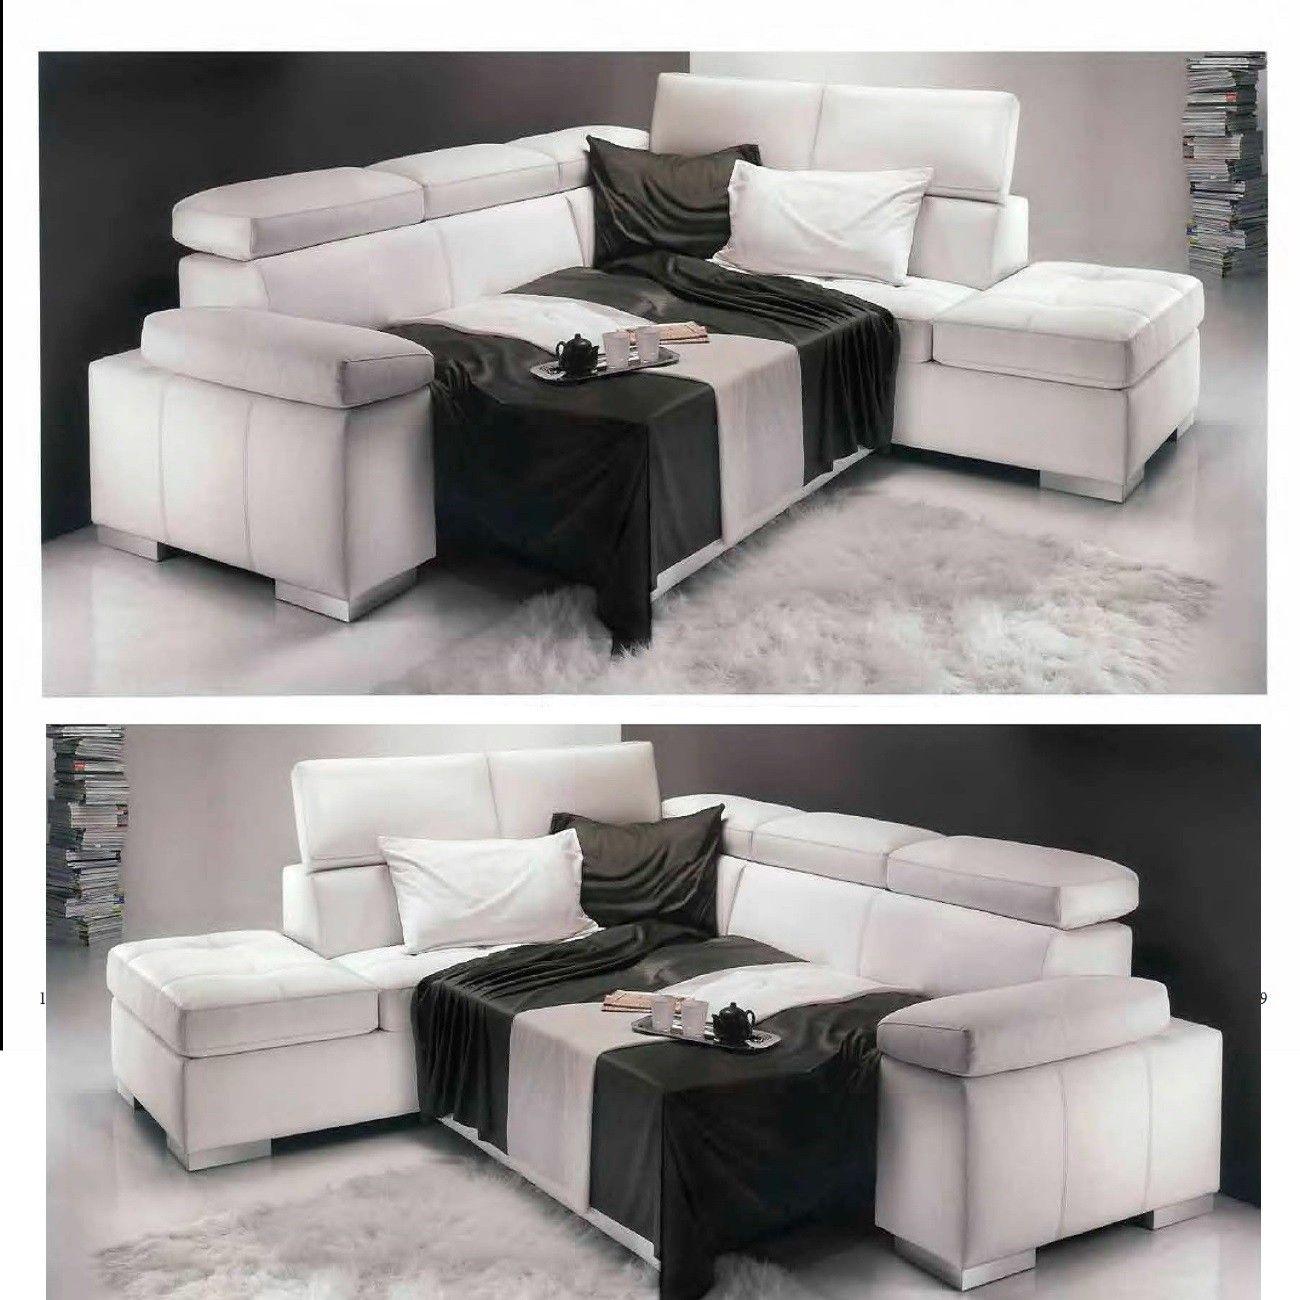 Divano Angolare Milano.Divano Angolare Milano Sala Furniture Home Decor Home